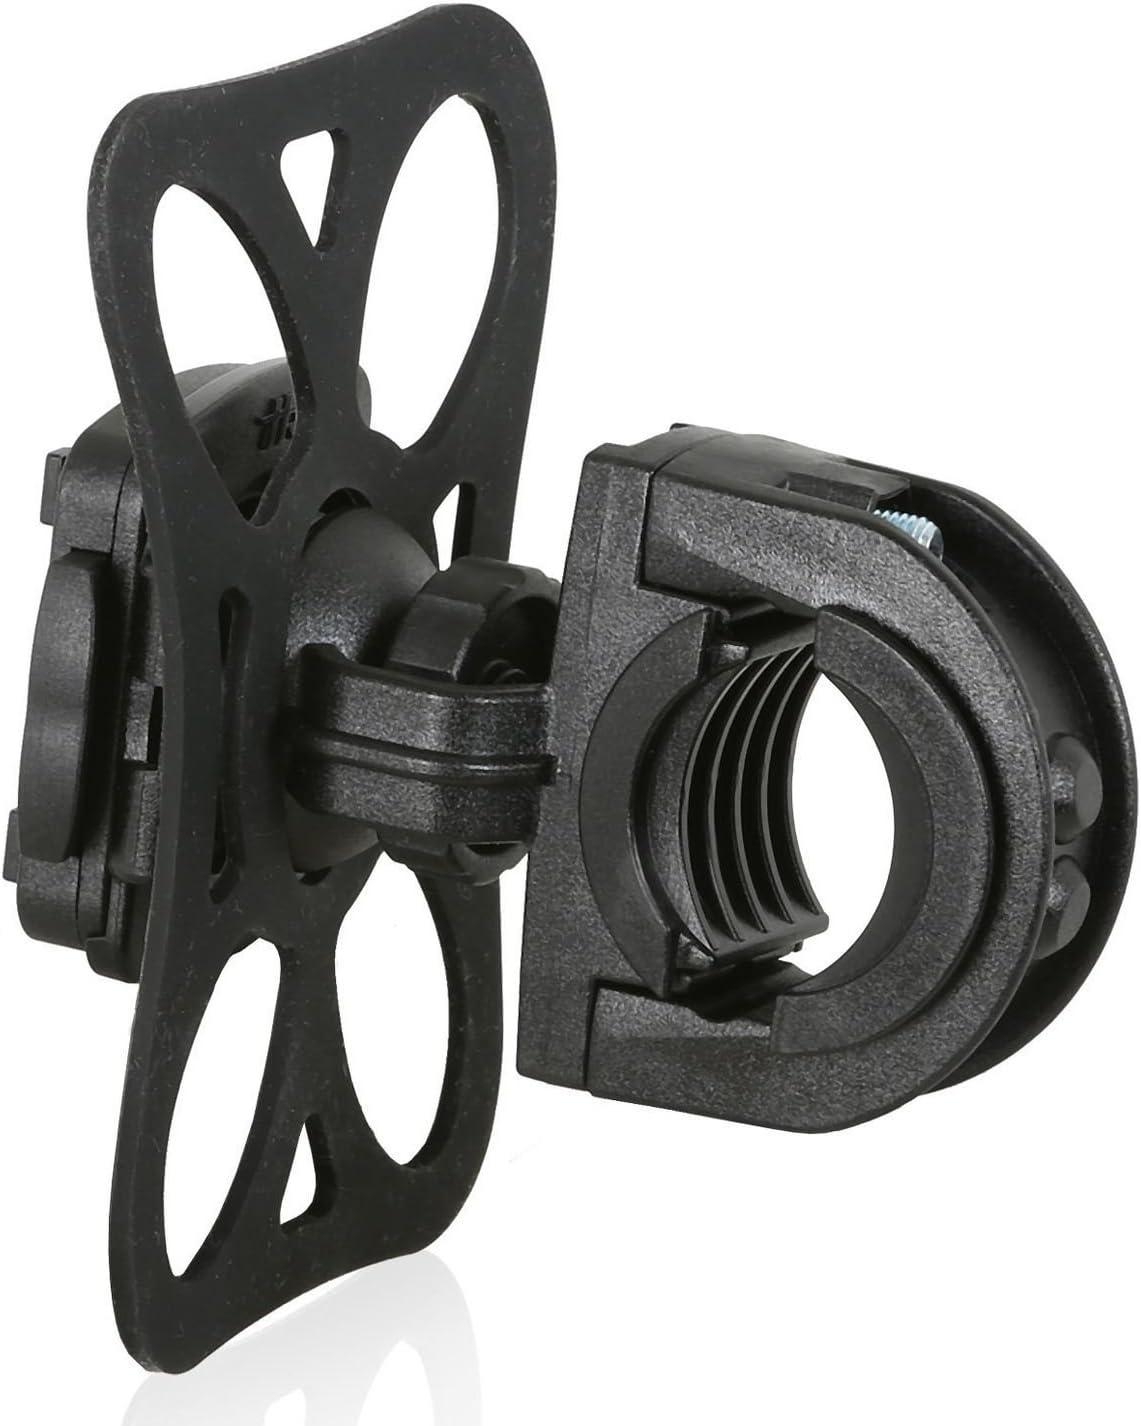 /Quickfix Made in Germany GPSMAP/ Wicked Chili Bike//Roller//Handlebar Mount for Garmin eTrex Astro Dakota Oregon Approach